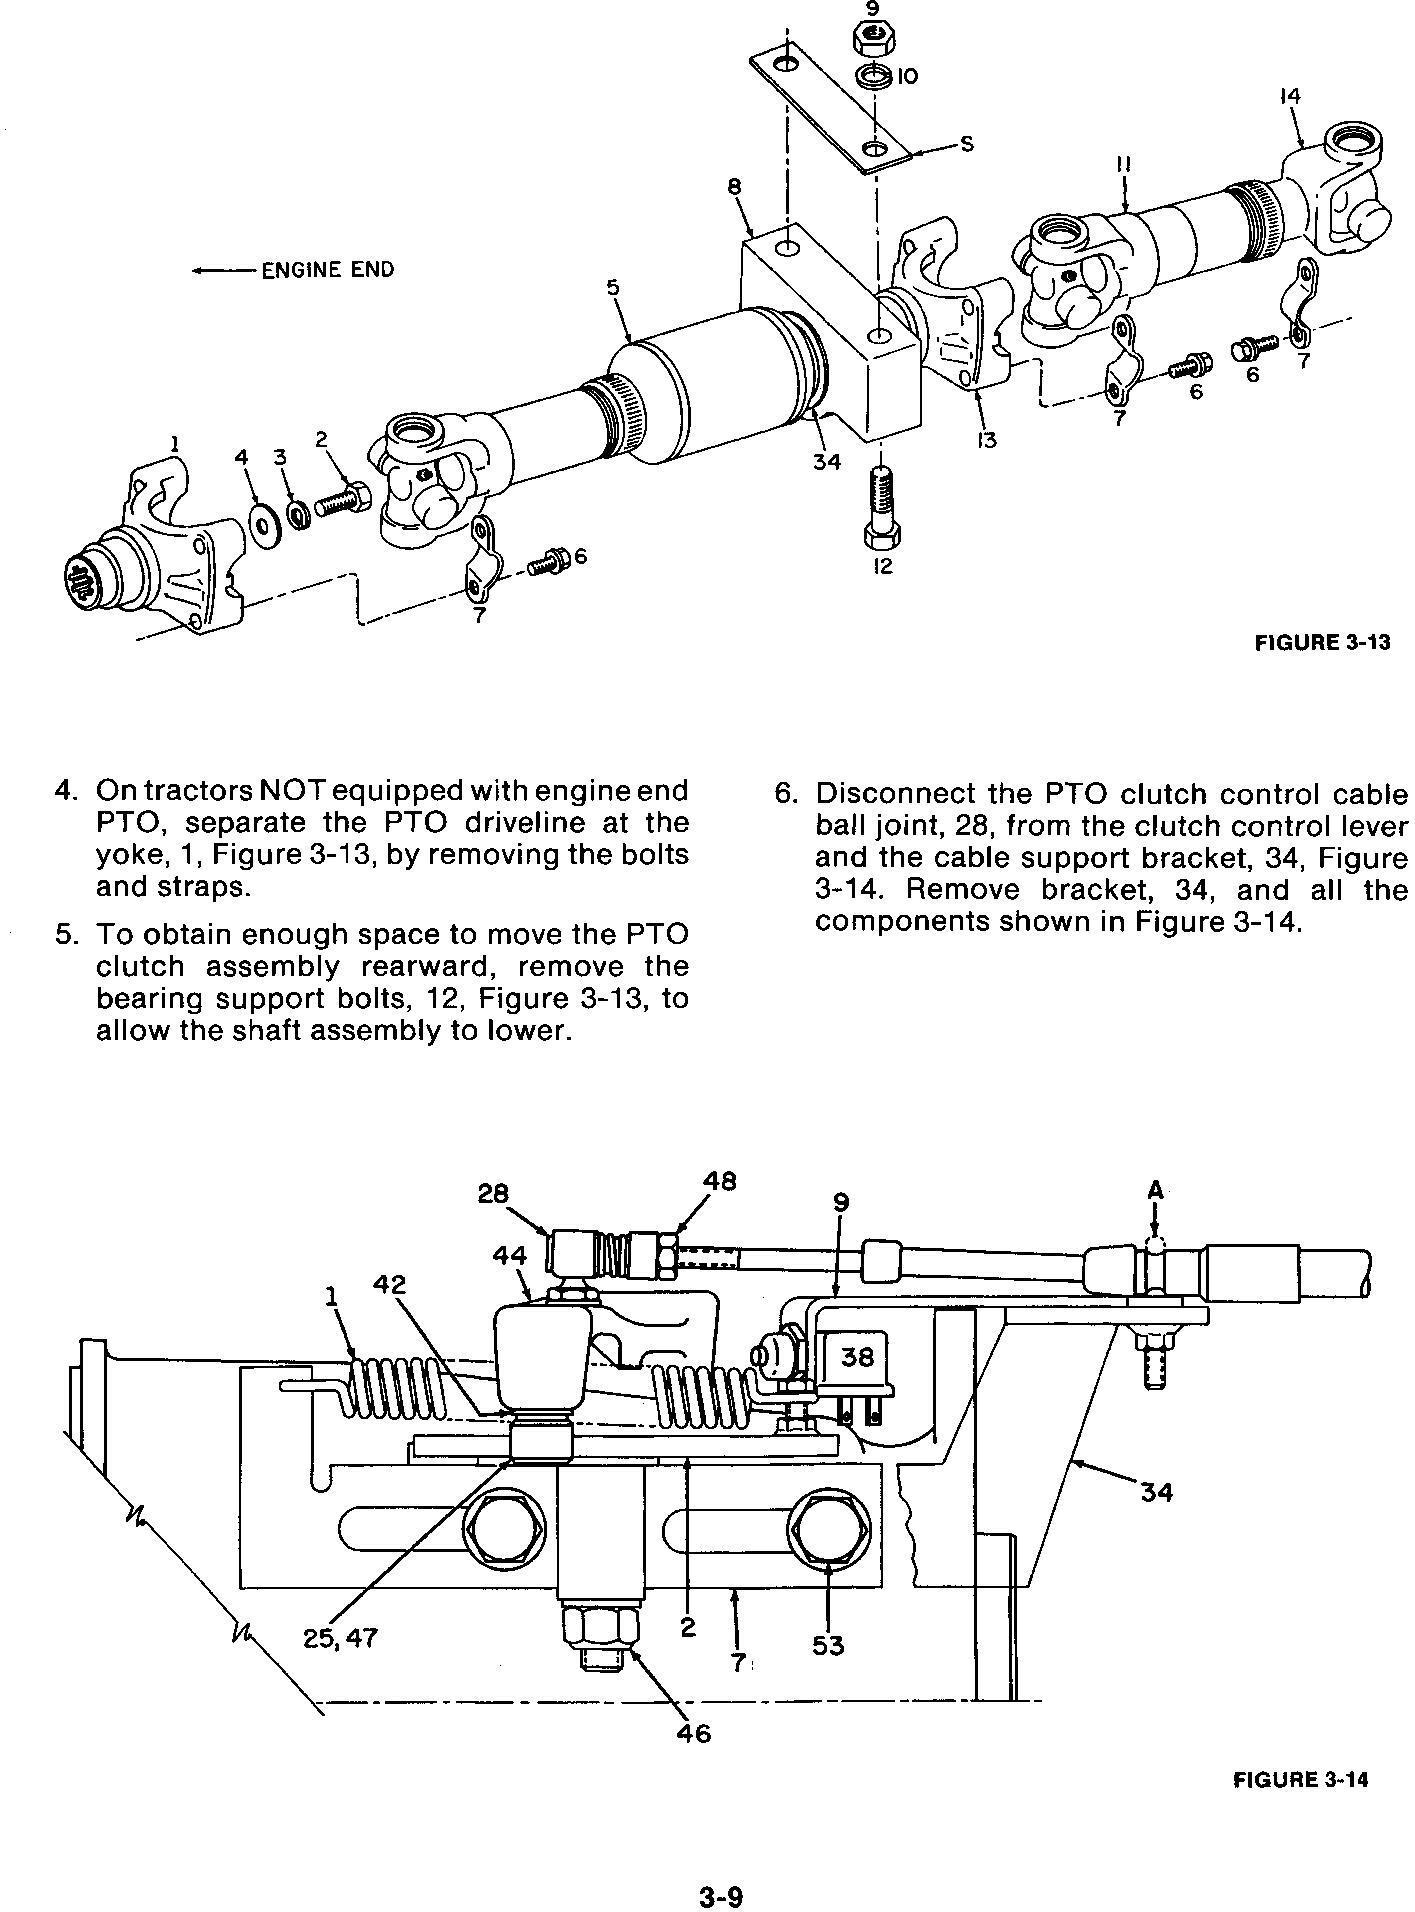 Ford 256, 276, 276 II Bi-directional Versatile Tractor Service Manual - 3